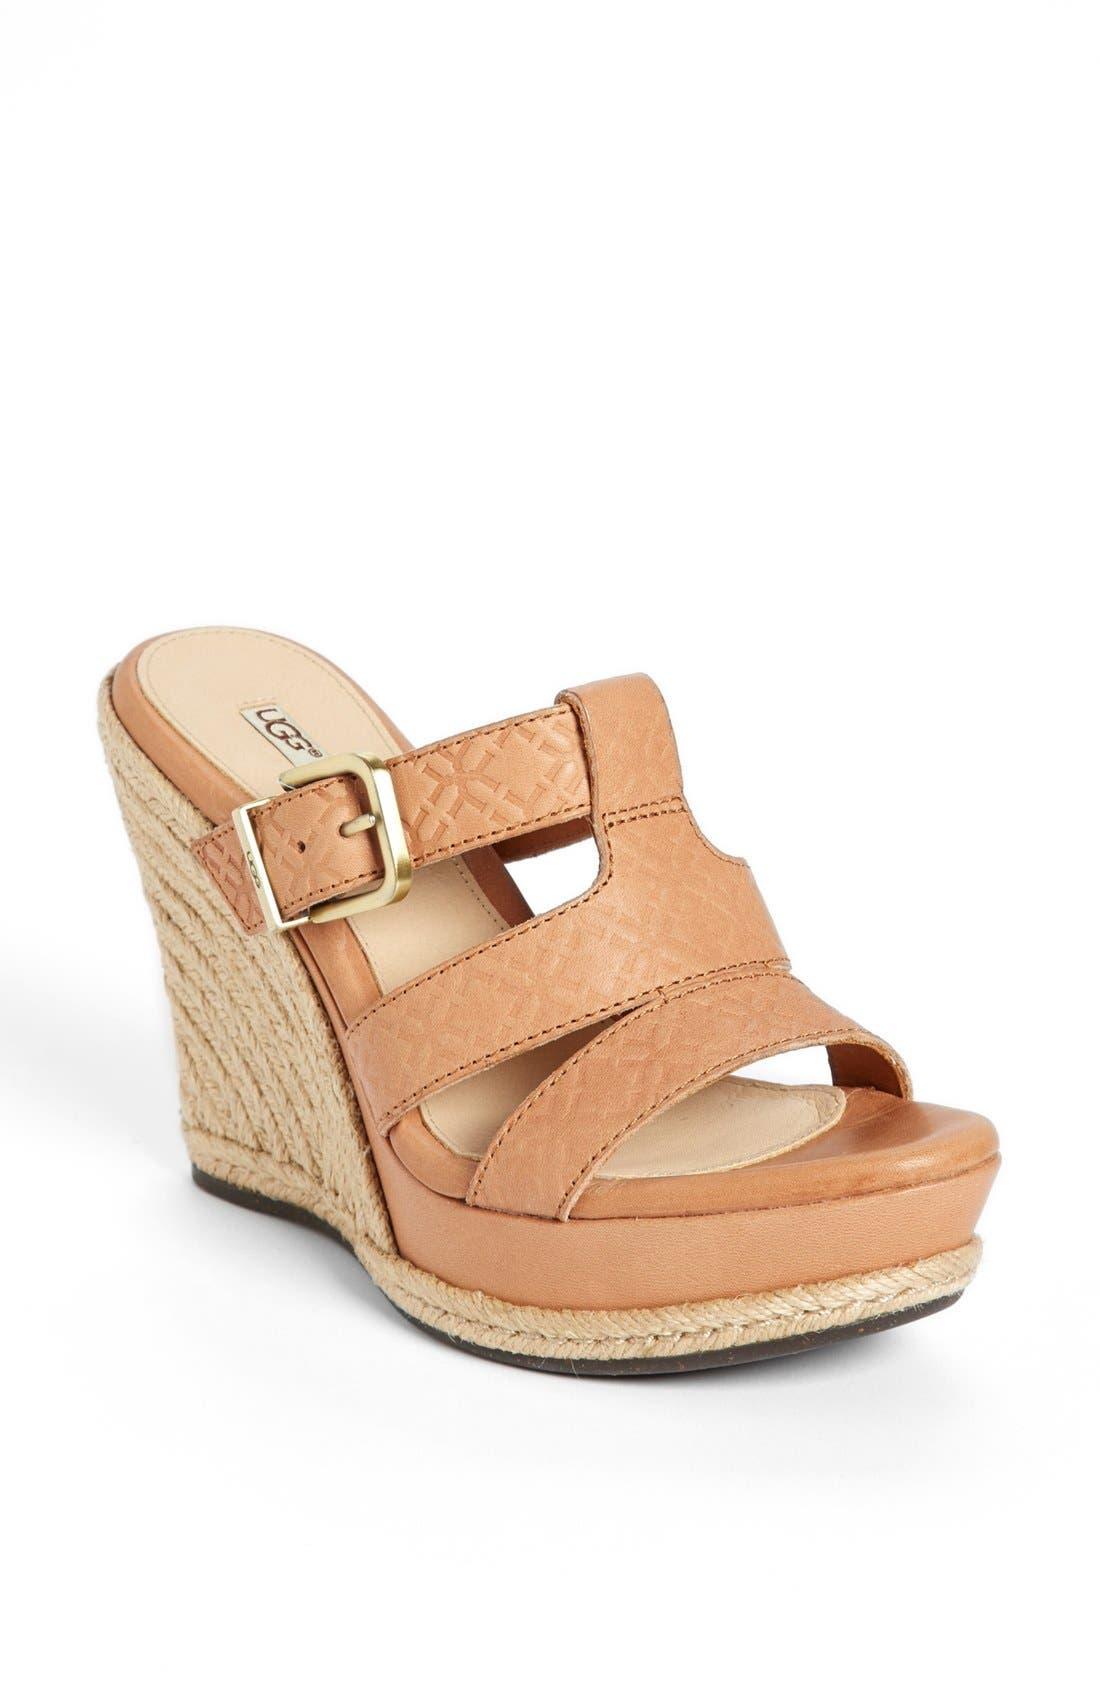 Main Image - UGG® Australia 'Hedy' Sandal (Women)